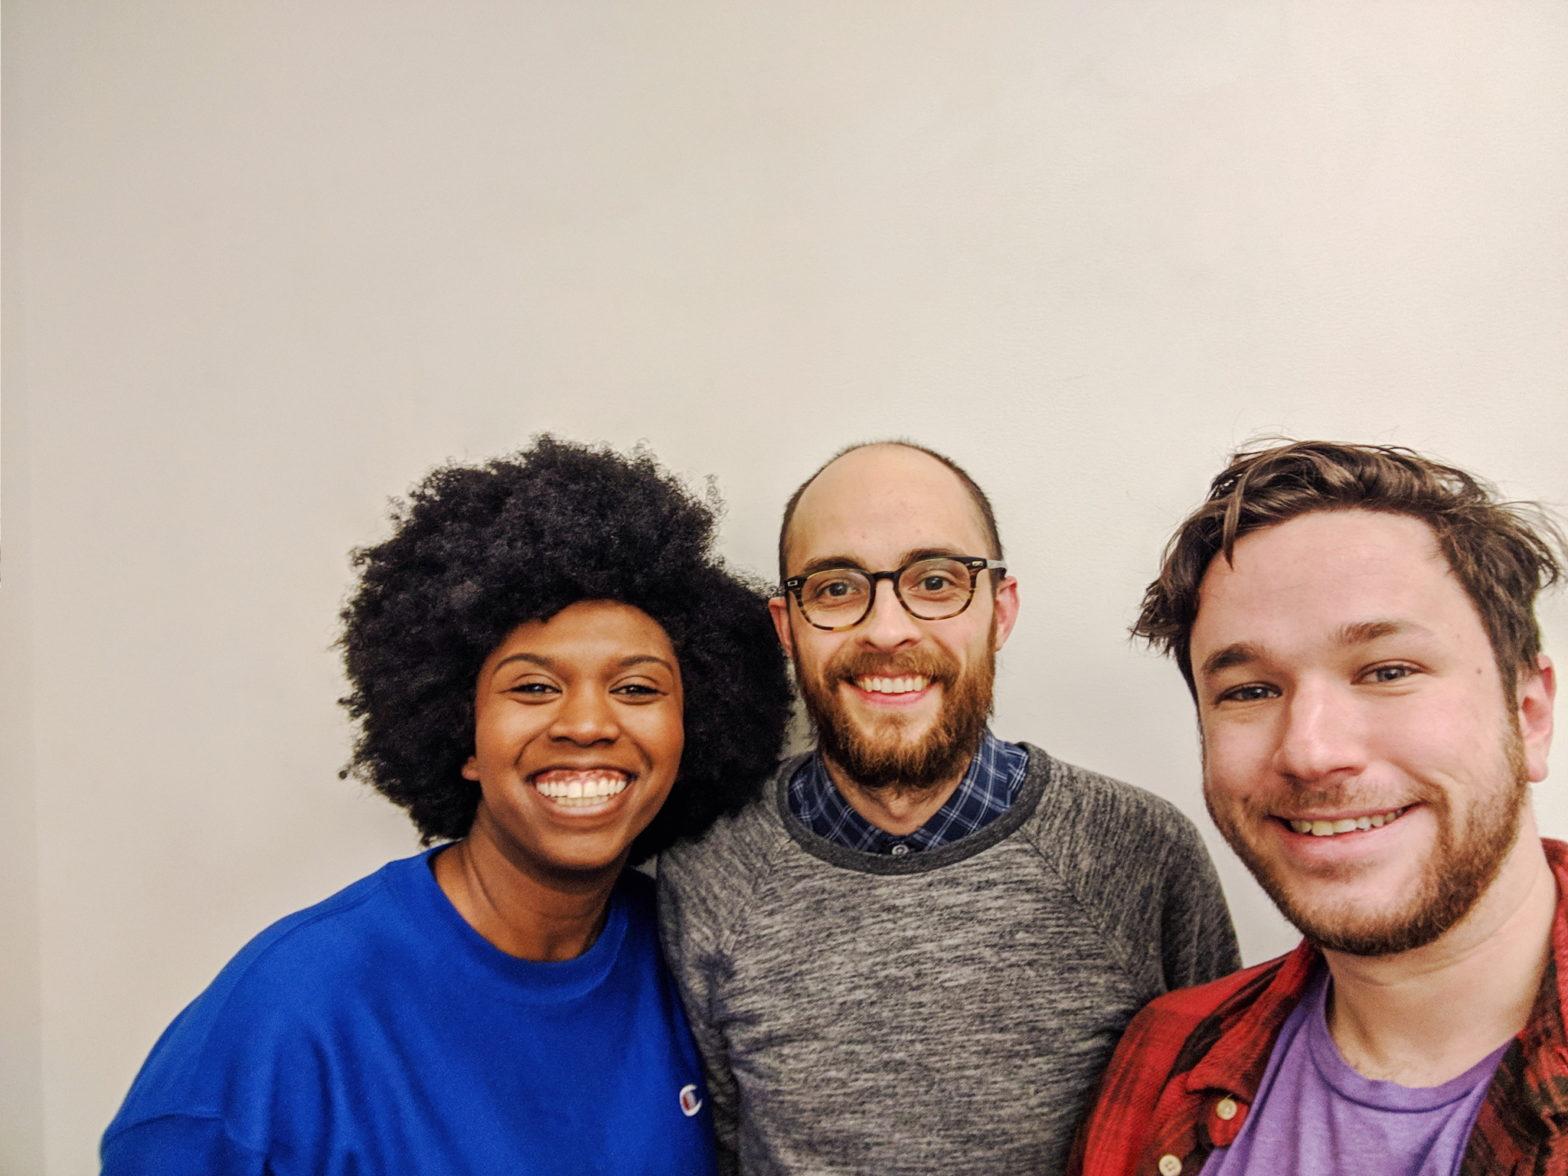 Rachel Pegram, Evan Forde Barden, and Patrick Cartelli taking a selfie